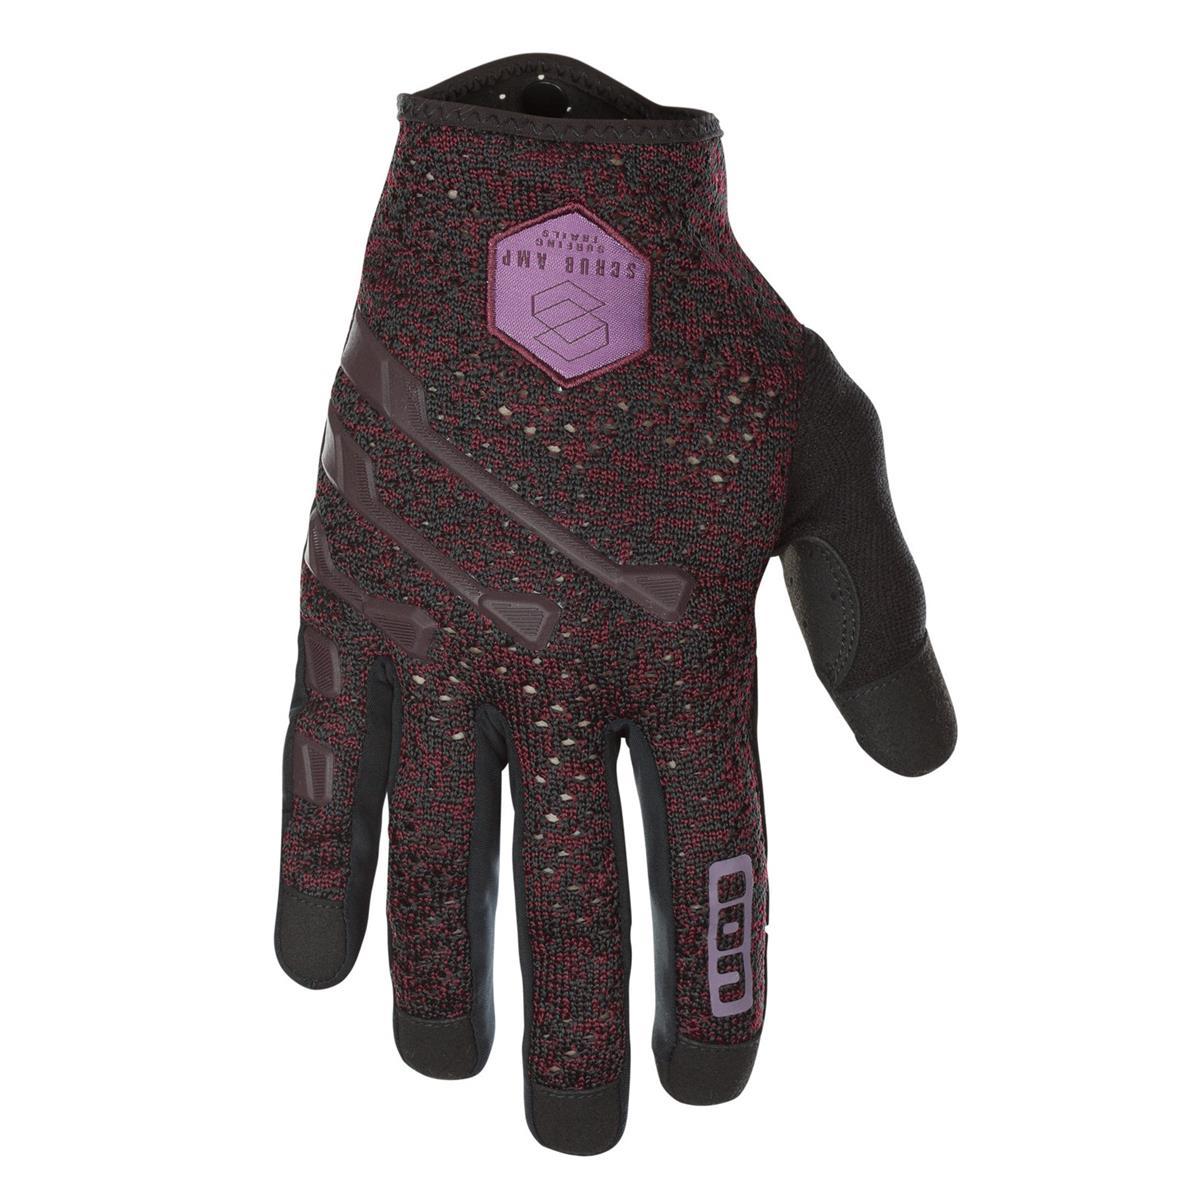 ION ION ION Bike-Handschuhe Scrub Amp Rosa Isover 3ff059